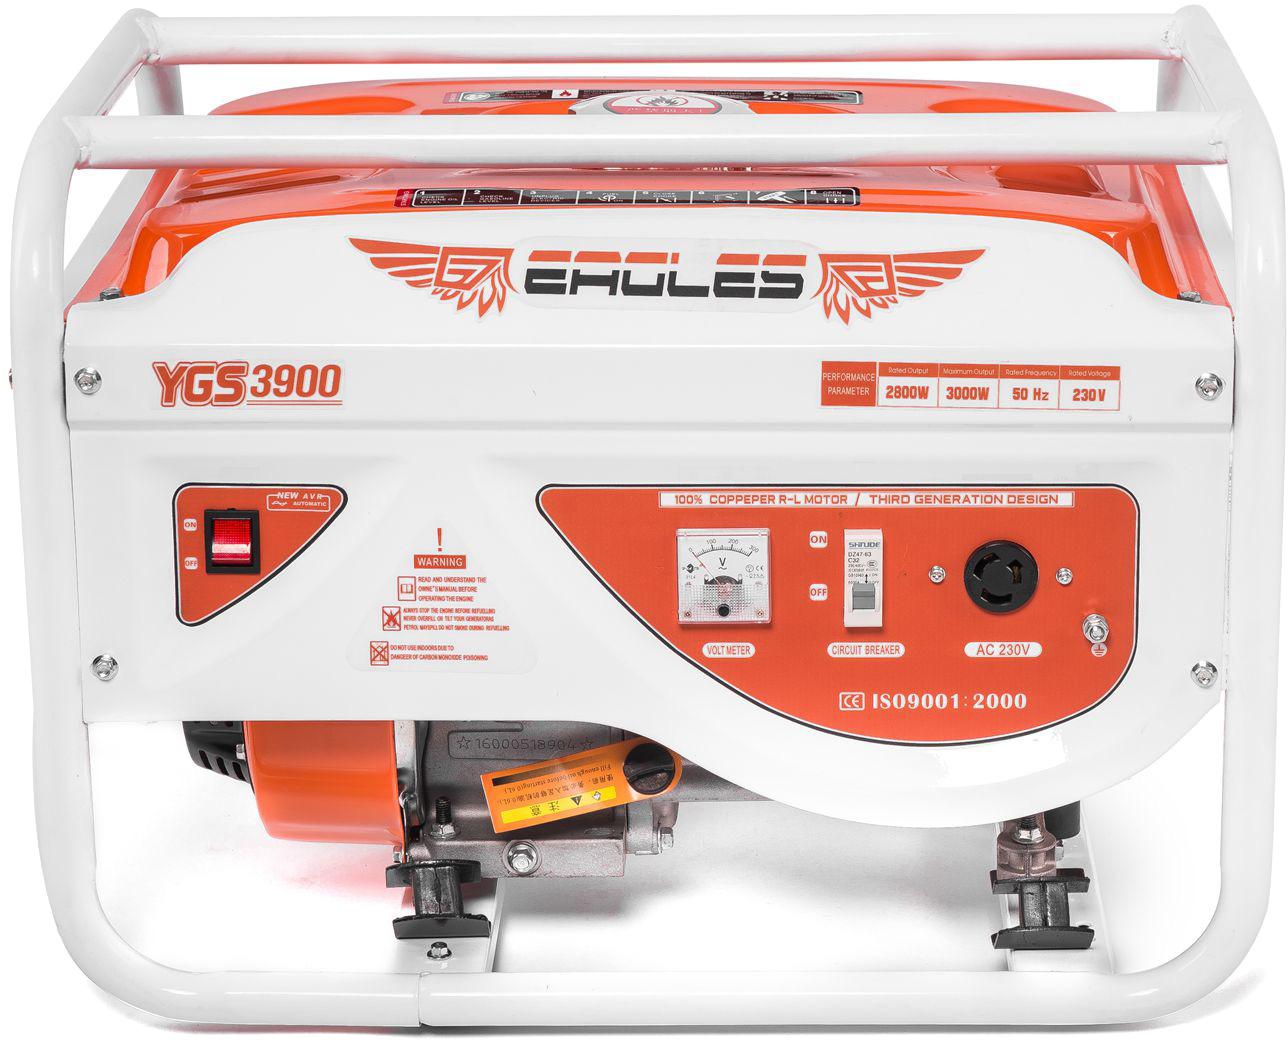 YGS3900伊格斯款汽油发电机